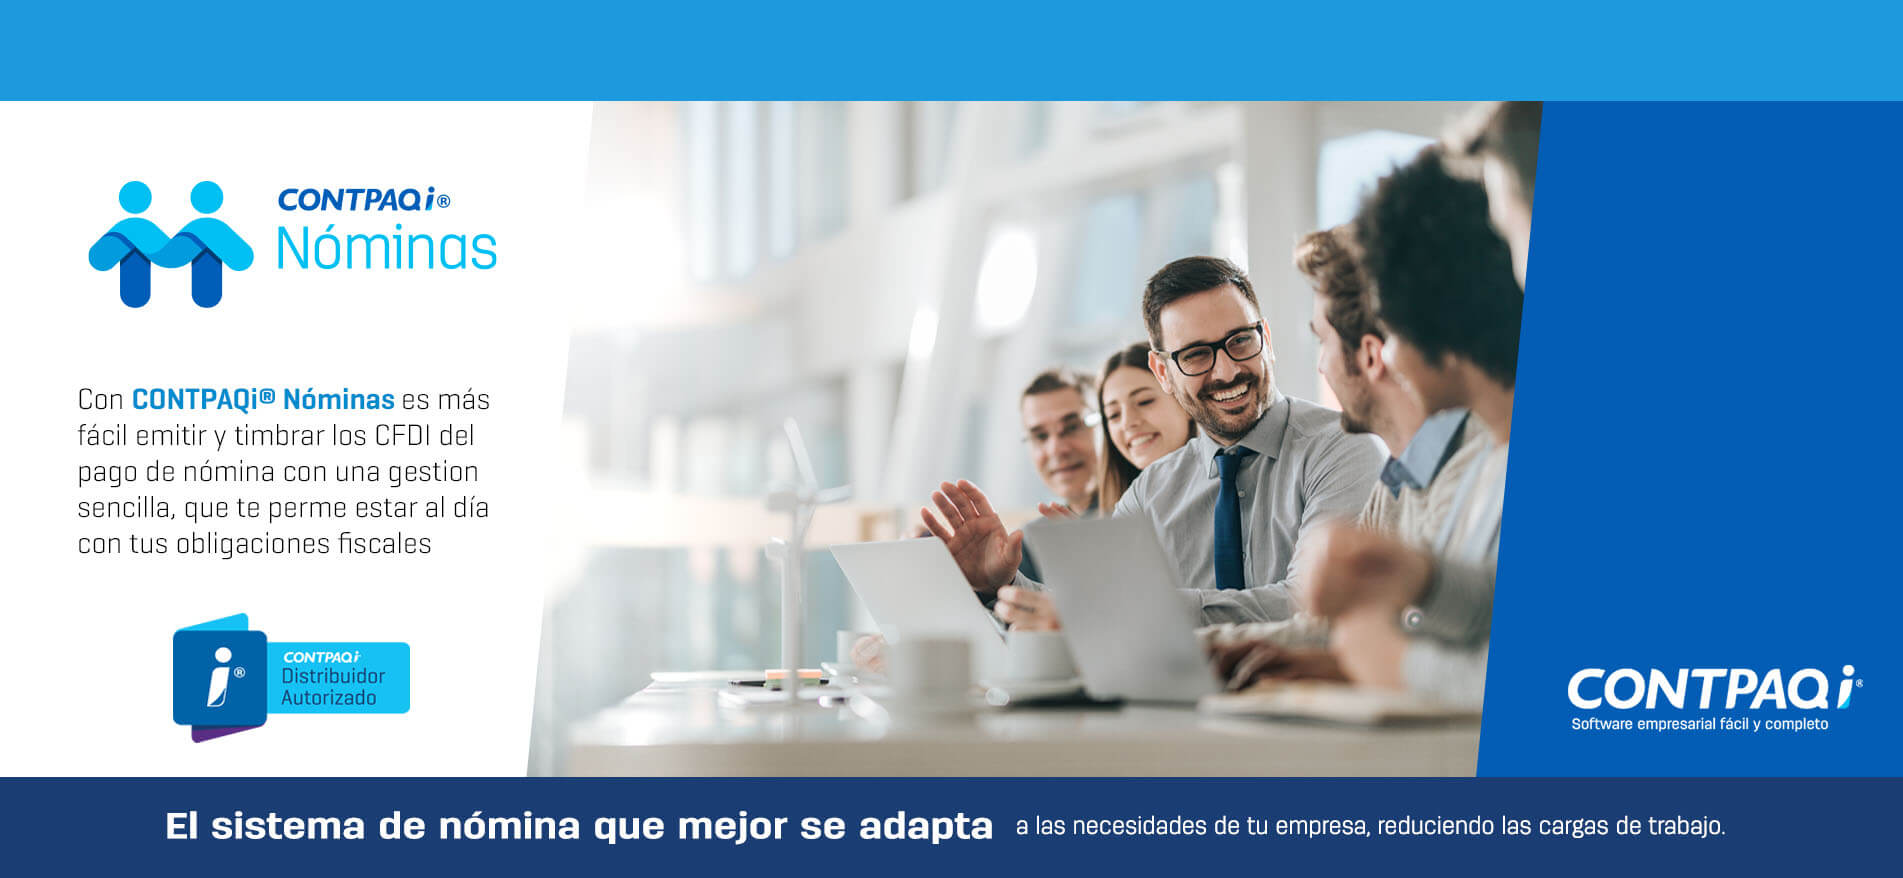 Contpaqi Nominas CFDI 3.3 Distribuidor Autorizado, Baja California, México